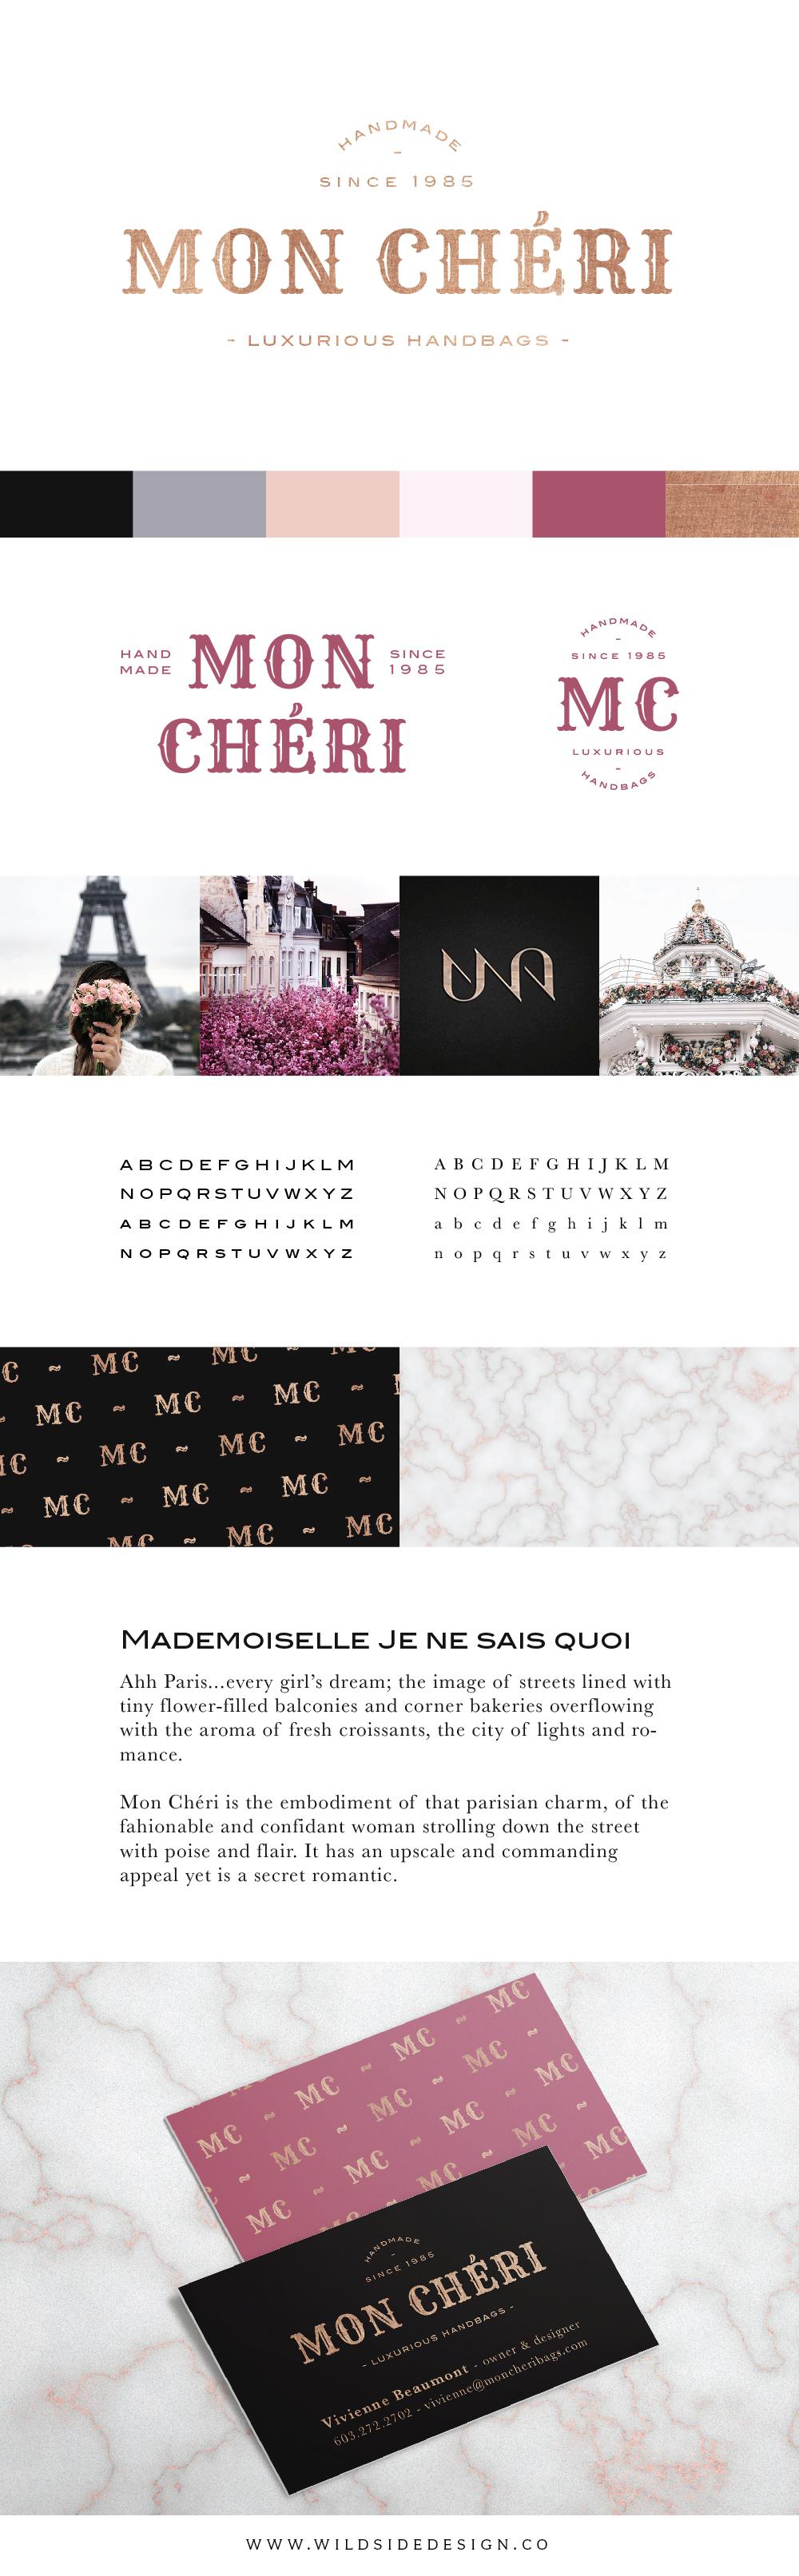 BRAND FOR SALE Luxury Logo Mon Chéri by Wild Side